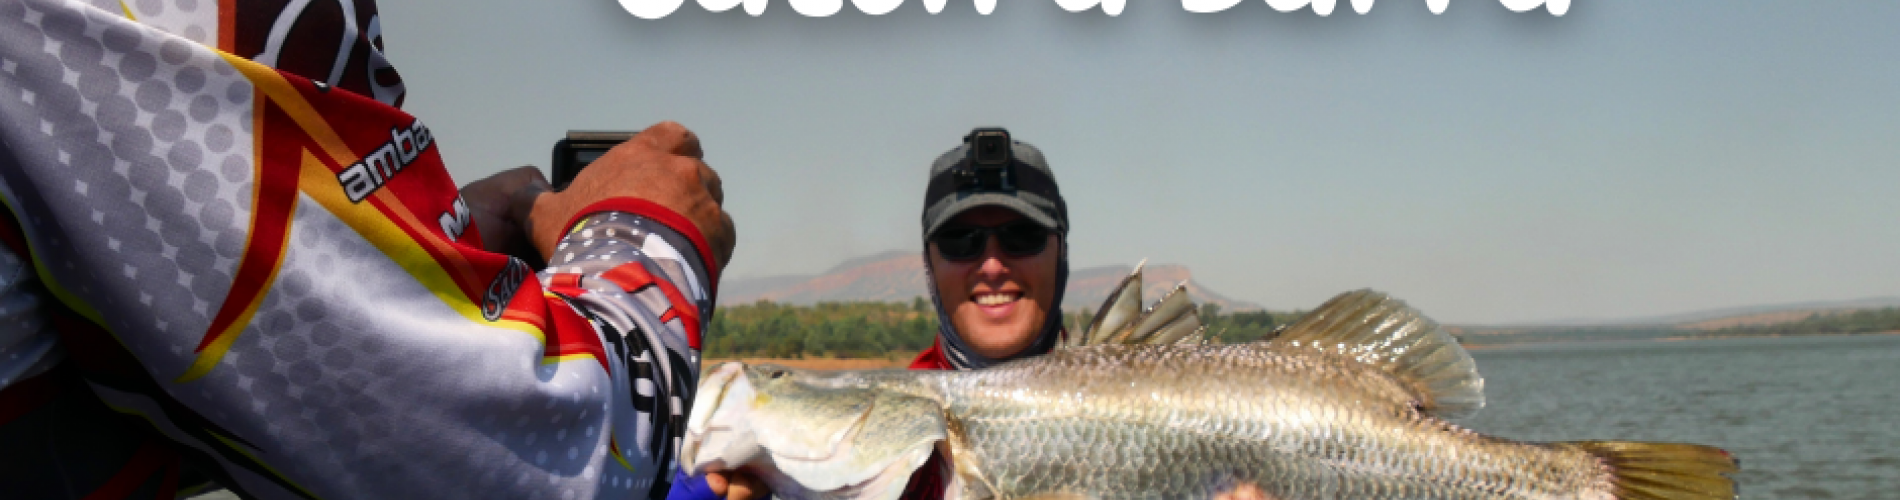 Fishing Tours and Charters in Kununurra